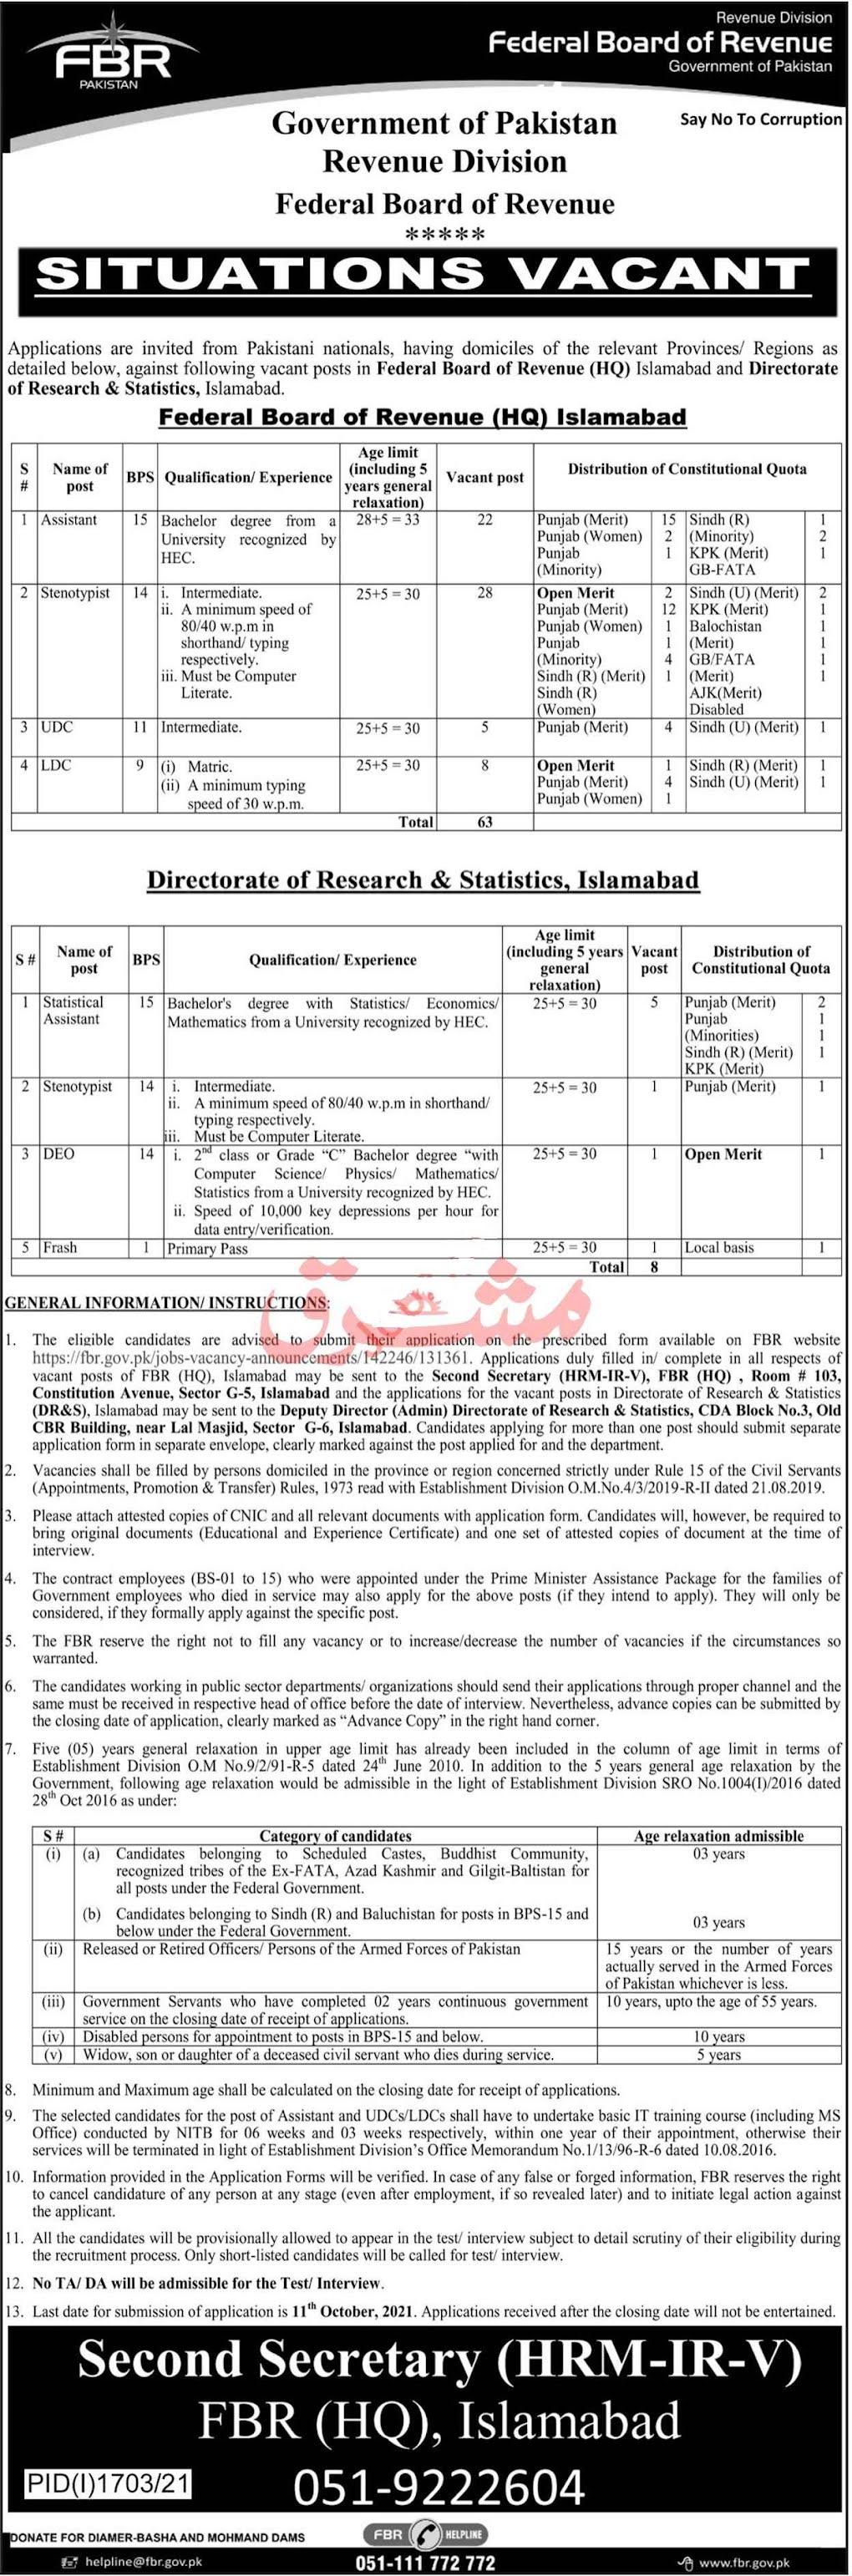 Federal Board of Revenue FBR Pakistan Revenue Division Jobs 2021